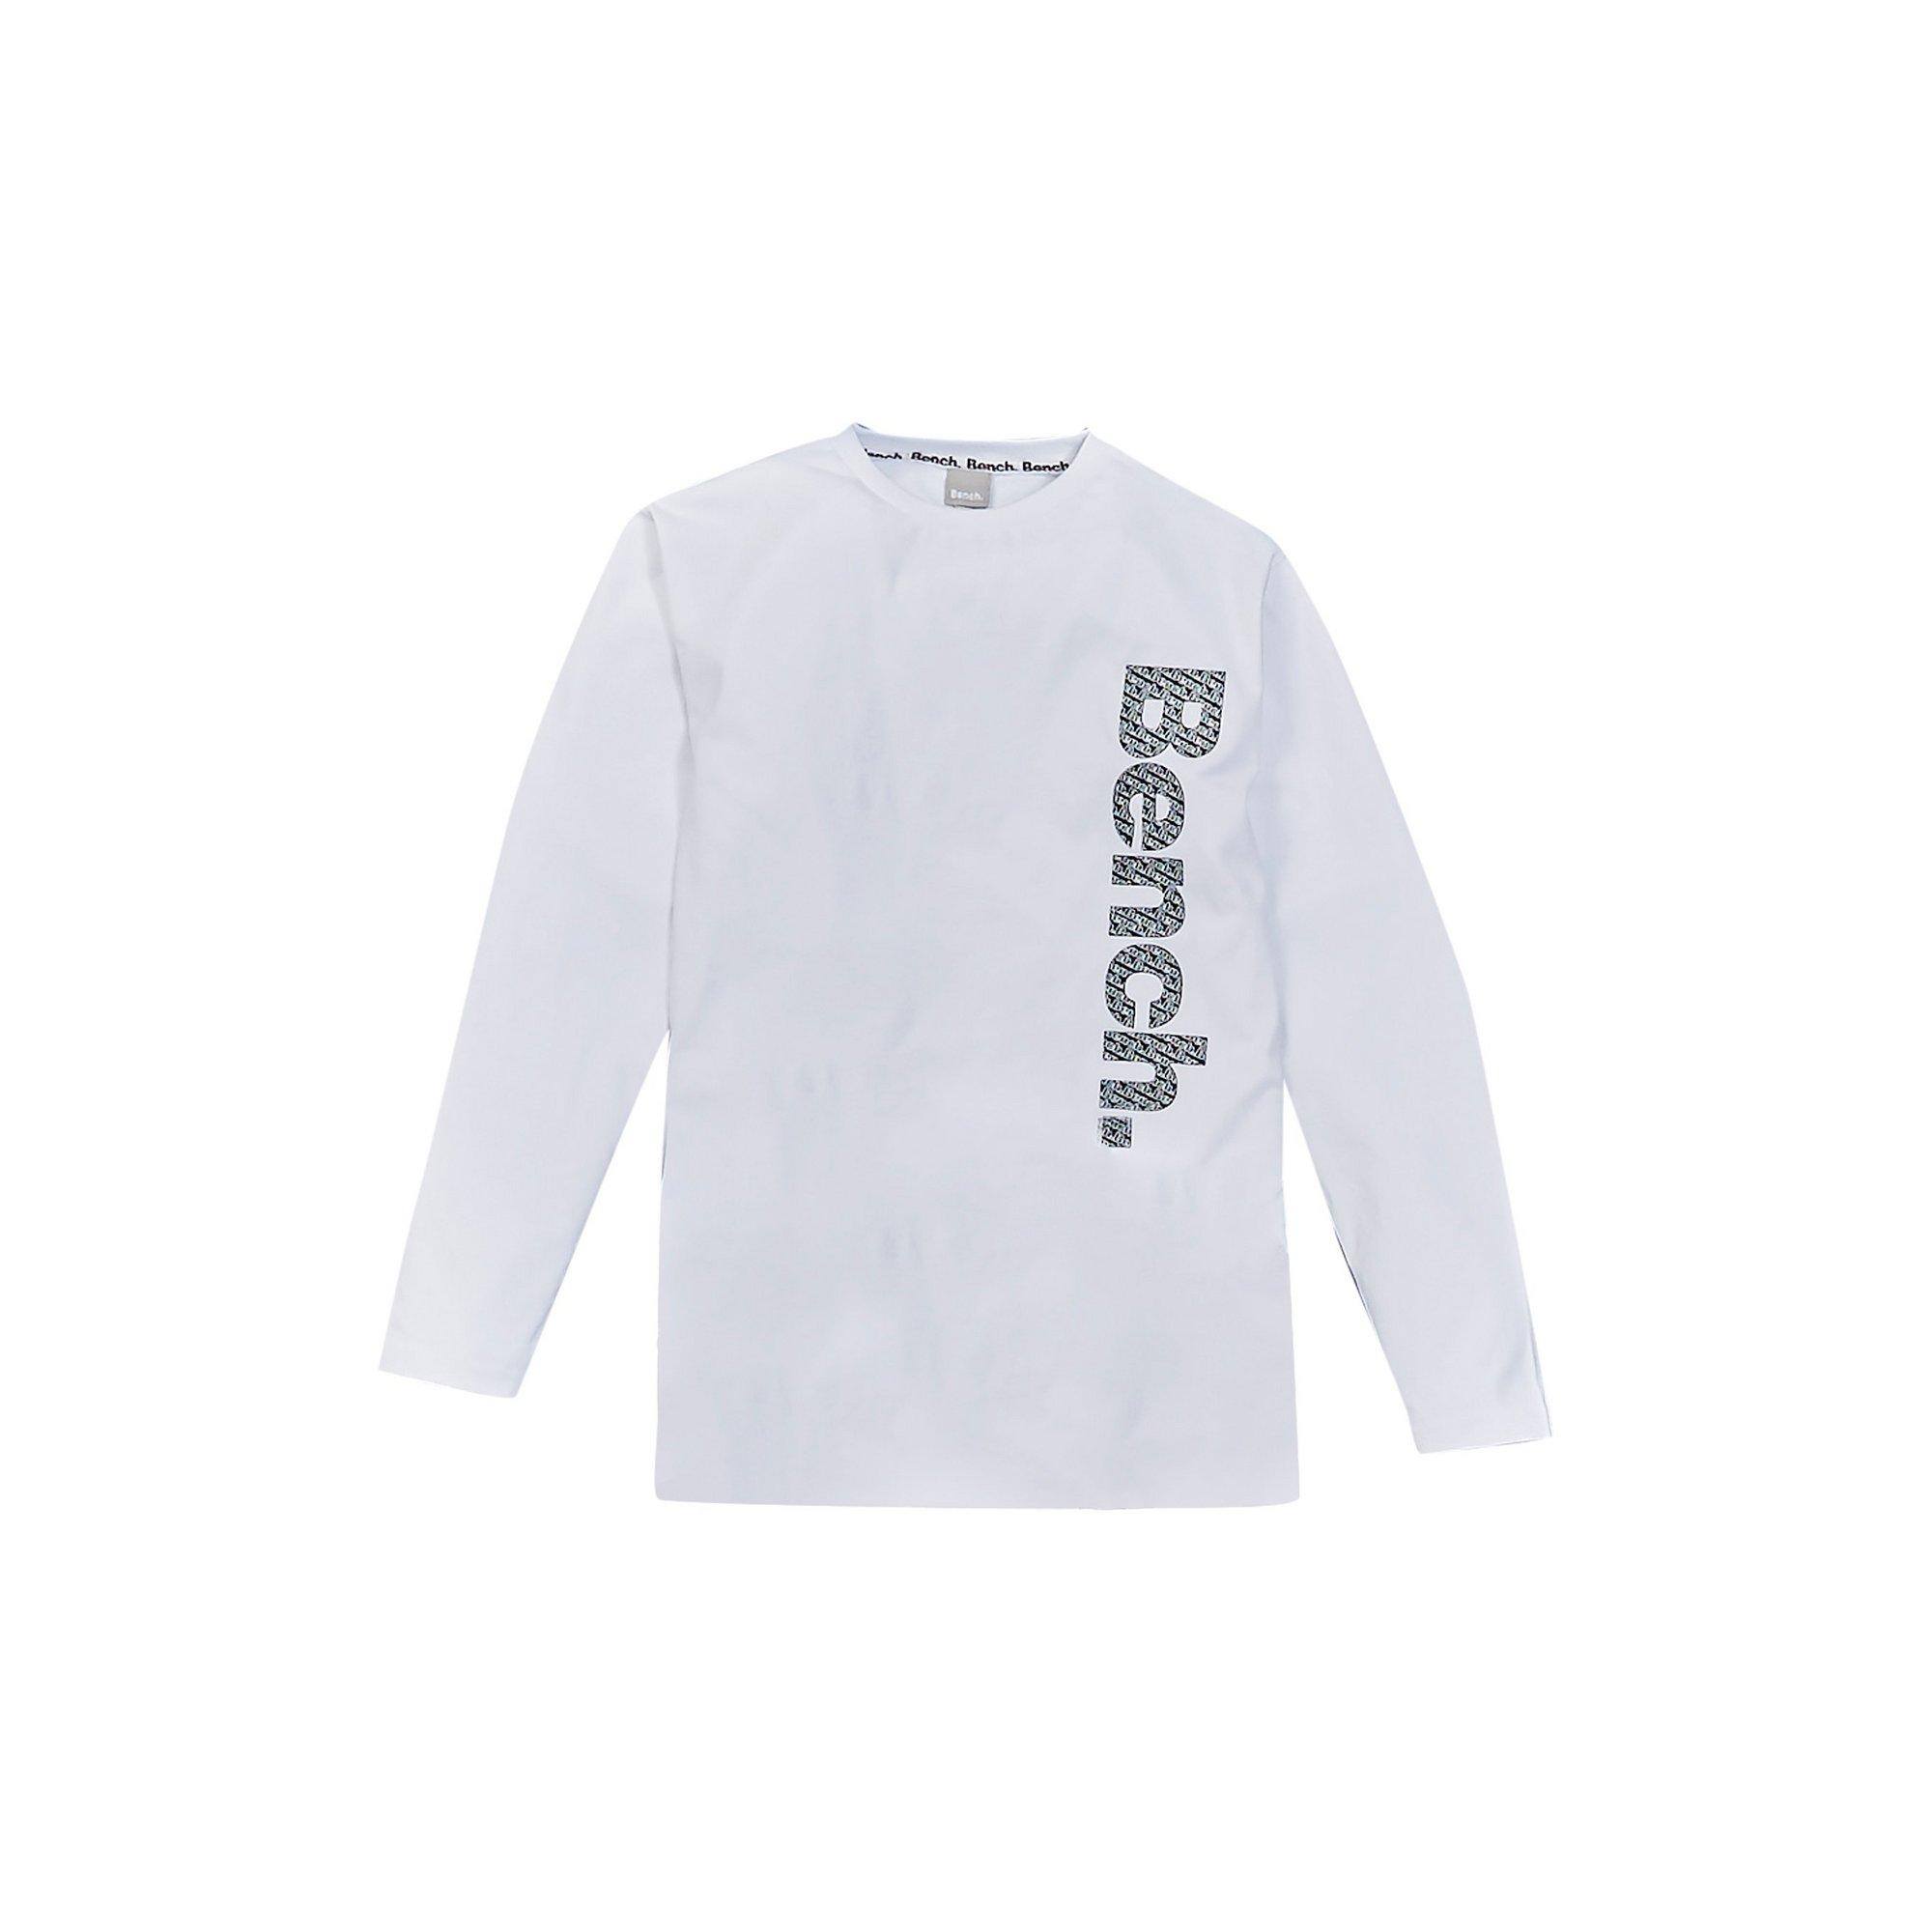 Image of Boys Bench Long Sleeved White T-Shirt